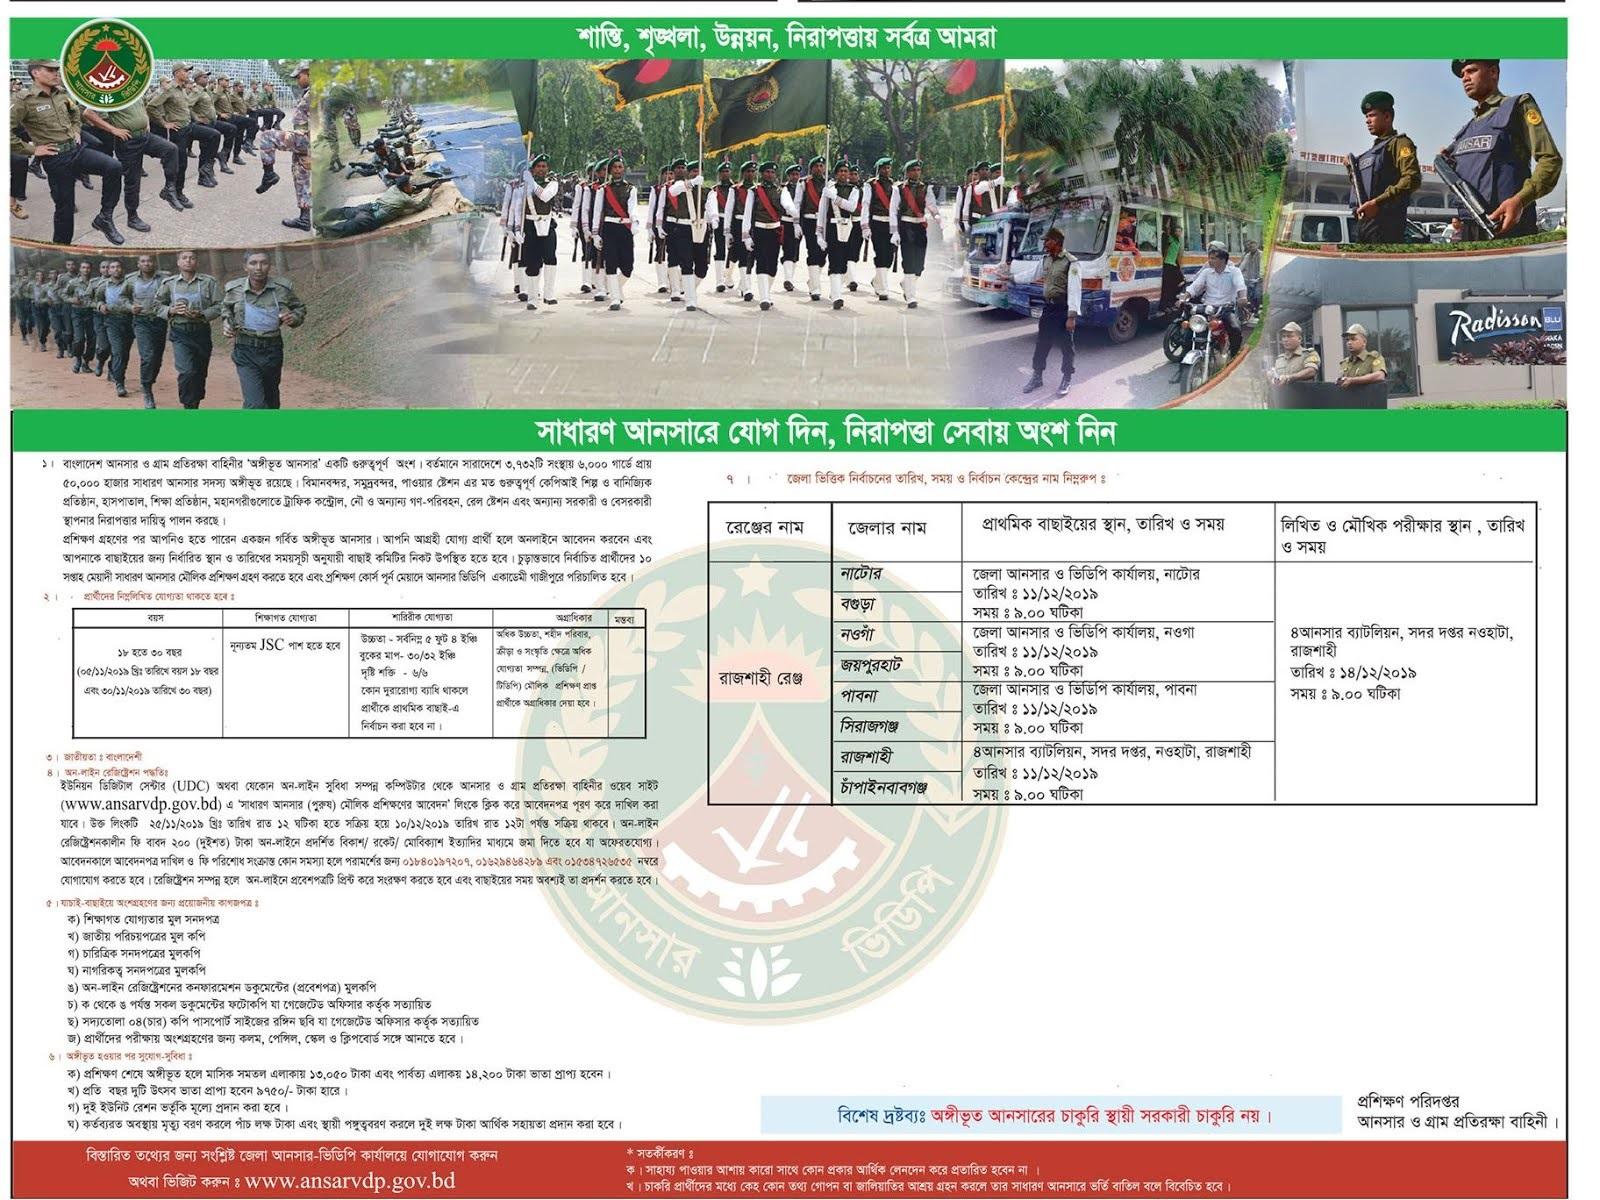 bangladesh army job circular 2019, bangladesh army circular 2019, www.army.mil.bd jobs circular 2019, join bangladesh army circular 2019, bangladesh army sainik job circular 2019, bangladesh army civil job circular 2019, www.army.mil.bd jobs circular 2018, www.army.mil.bd 2019, সেনাবাহিনীতে চাকরি ,Army Job Circular 2020 Bangladesh, বাংলাদেশ সেনাবাহিনী নিয়োগ ২০২০, বাংলাদেশ সেনাবাহিনীর সার্কুলার ২০১৯, সেনাবাহিনী নিয়োগ বিজ্ঞপ্তি ২০১৯, বাংলাদেশ সেনাবাহিনী নিয়োগ বিজ্ঞপ্তি ২০১৯, বাংলাদেশ সেনাবাহিনী নিয়োগ 2019, বাংলাদেশ সেনাবাহিনী বেসামরিক নিয়োগ ২০১৯, বাংলাদেশ সেনাবাহিনী নিয়োগ ২০১৯ ব্যাচ, বাংলাদেশ সেনাবাহিনী সৈনিক পদে নিয়োগ ২০১৯,